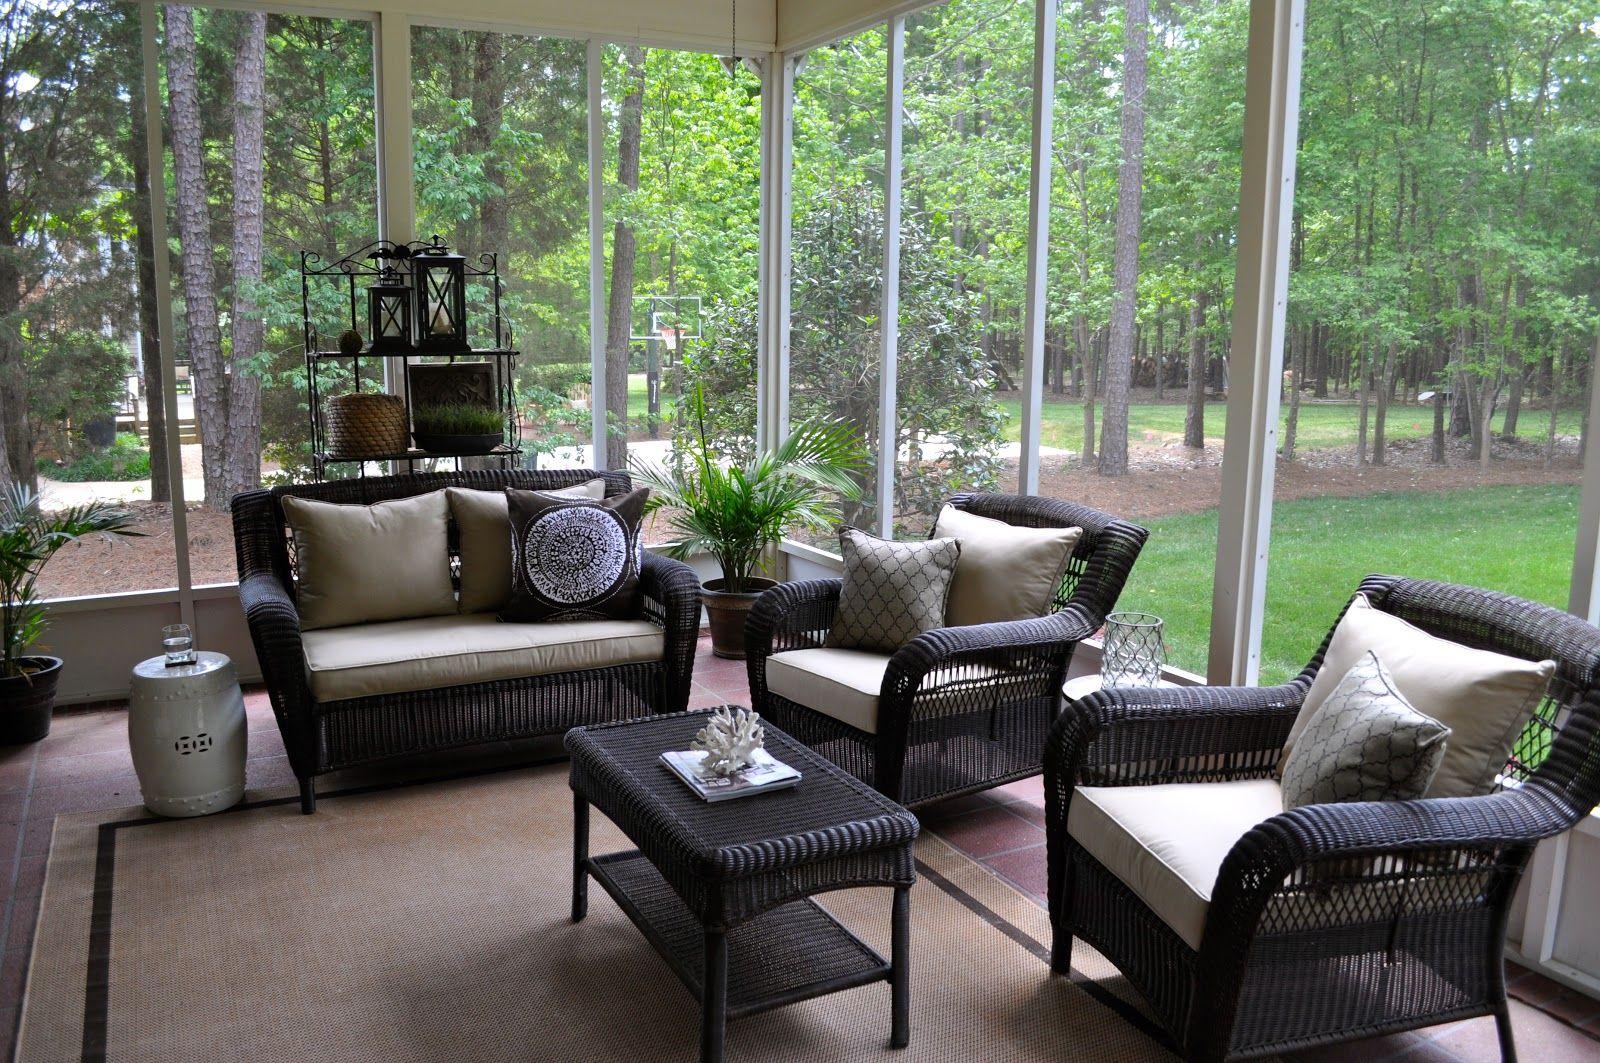 sams patio furniture in screened porch